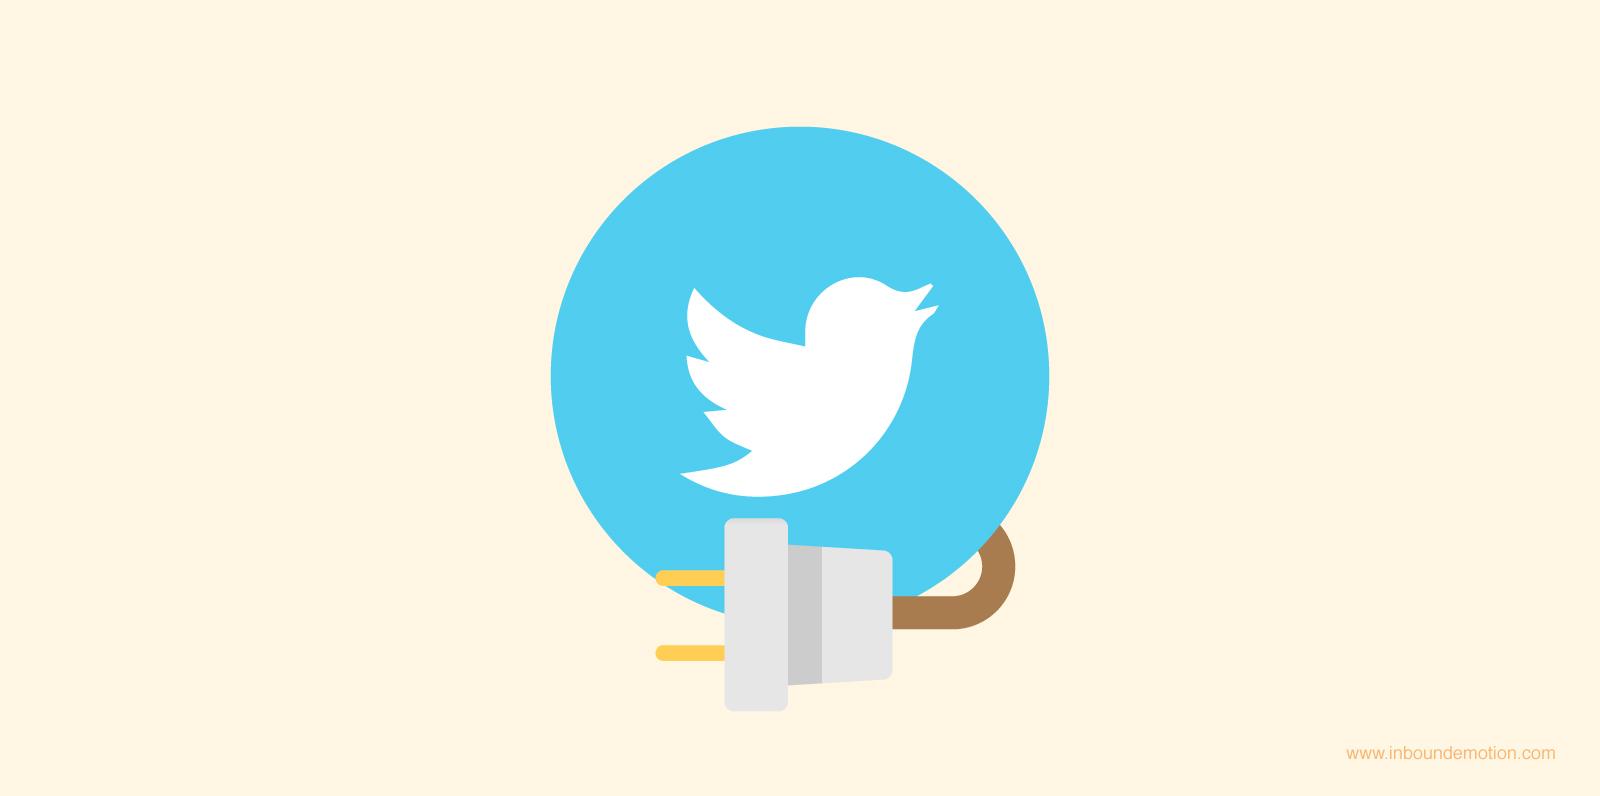 Com_monitoritzar_marca_Twitter